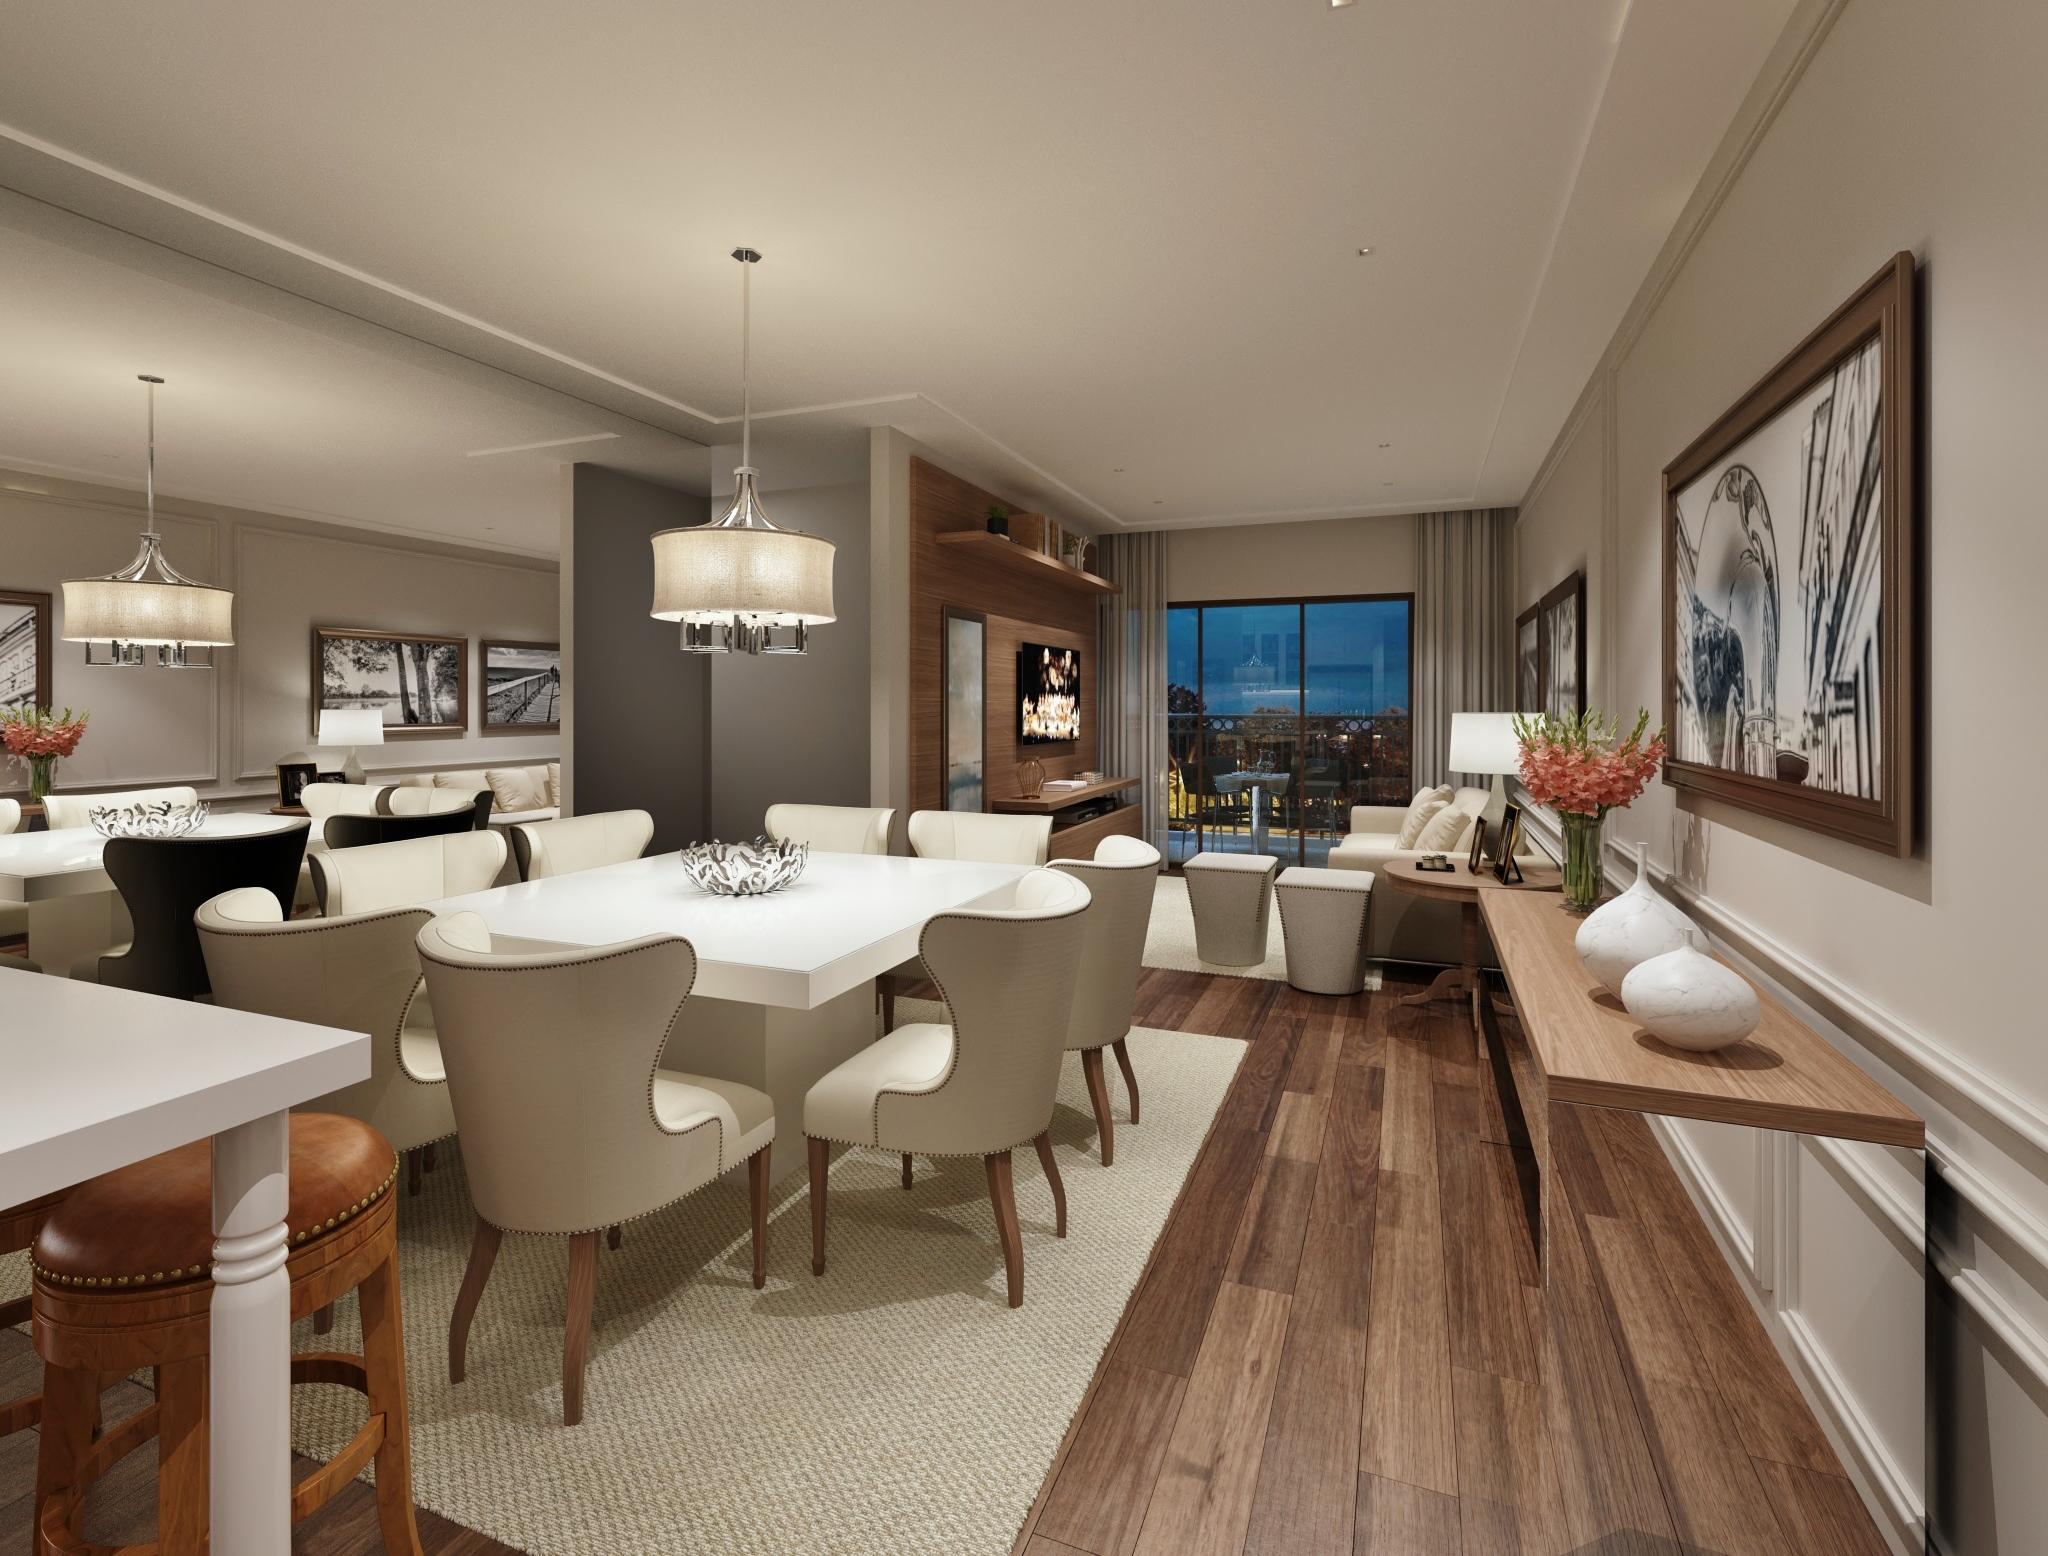 zorzi-engenharia-ideale-uno-living-room-2.jpg